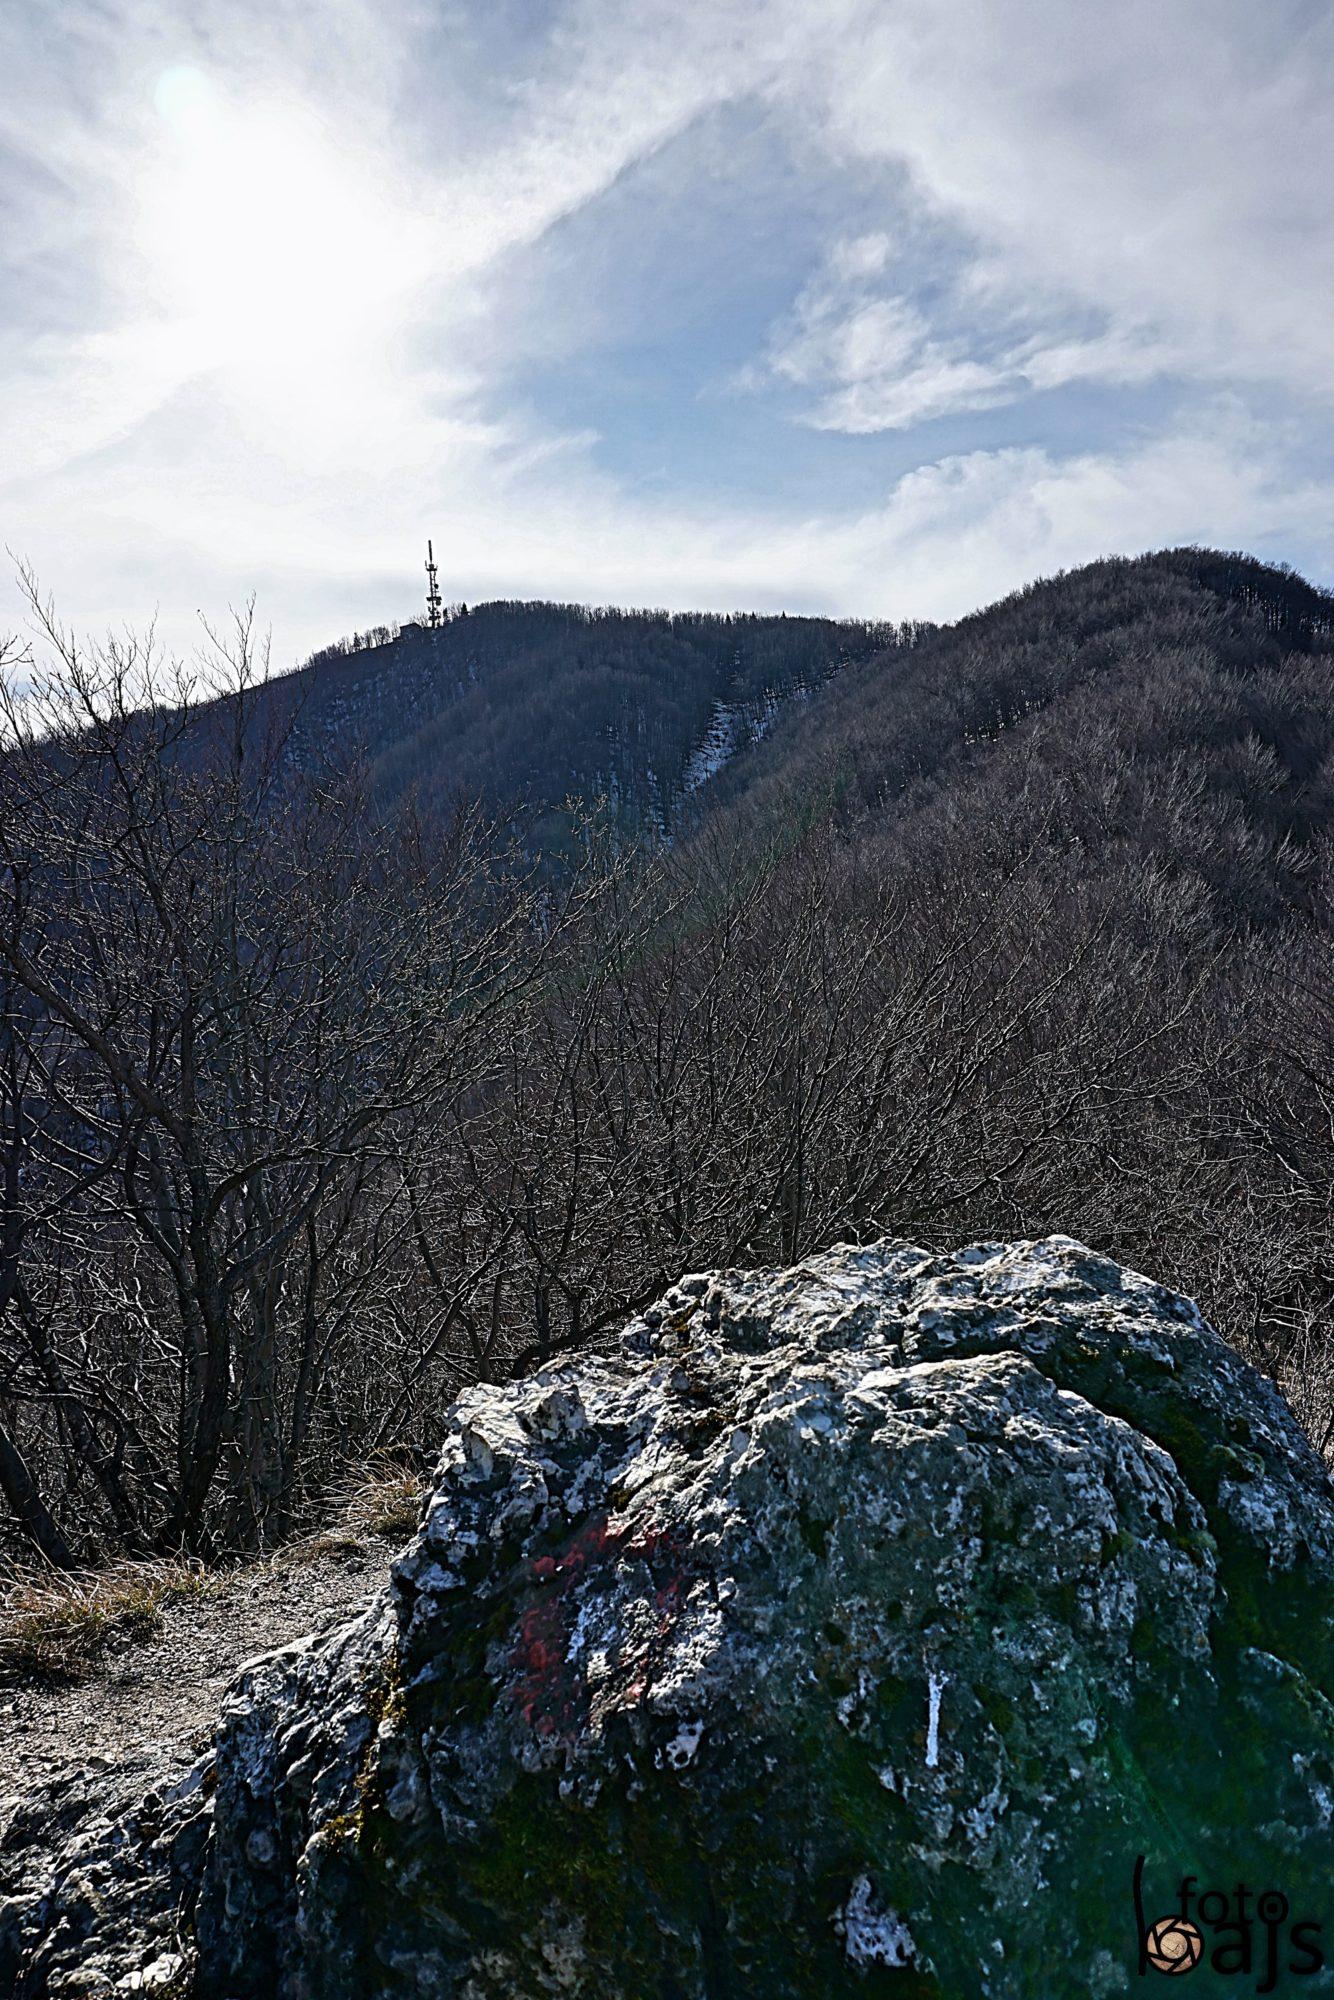 Ivanščica 05.02.2017